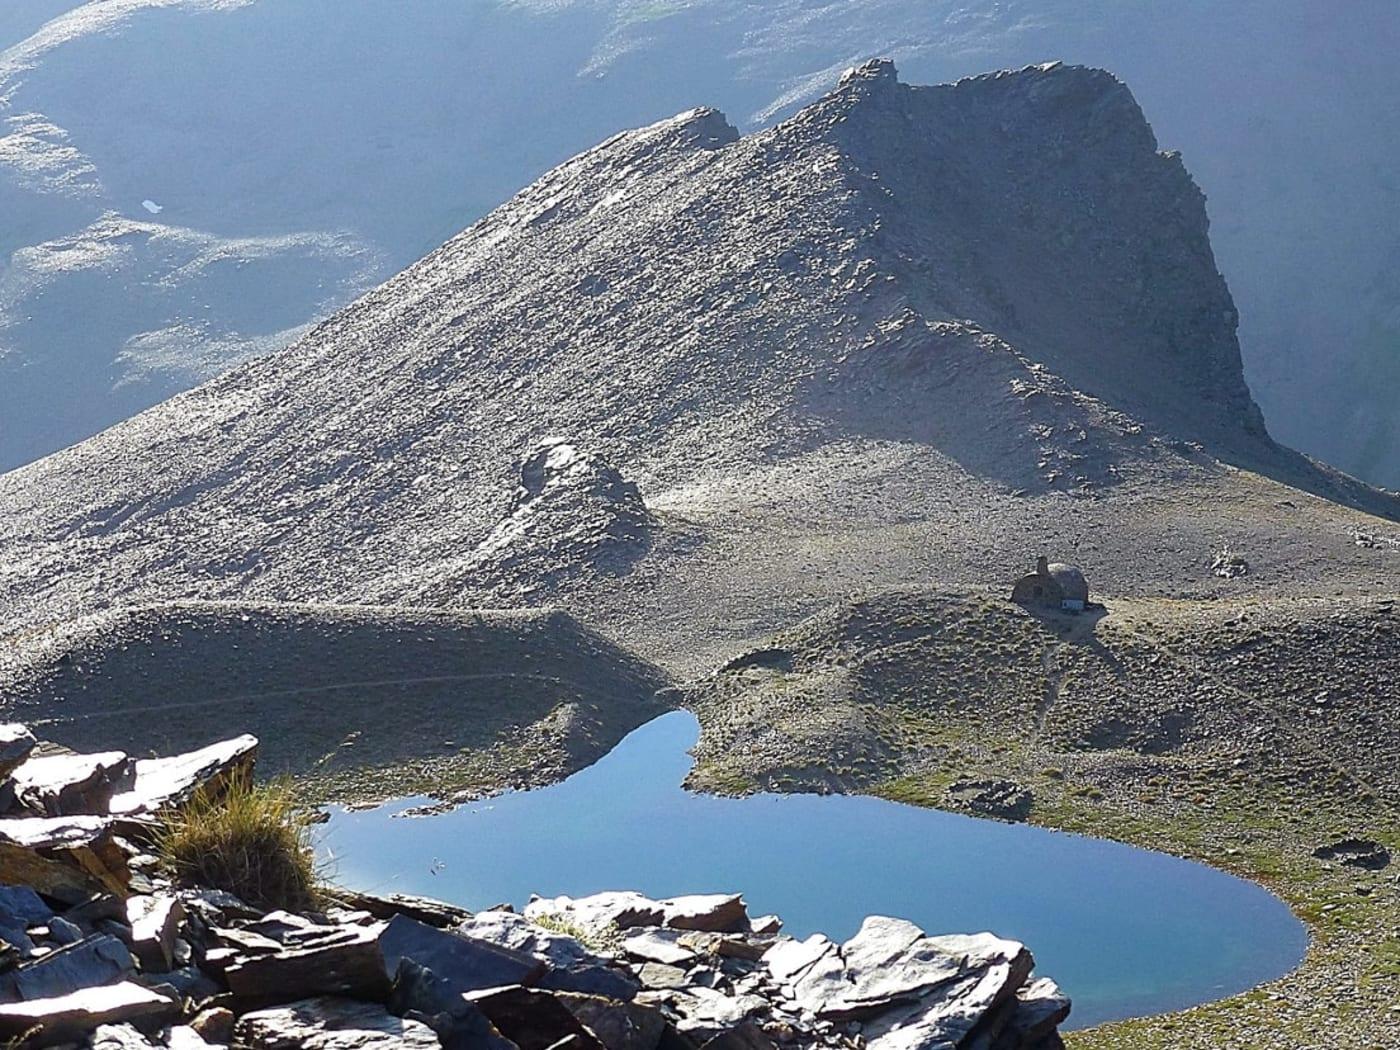 The Mountain Lakes of the Sierra Nevada